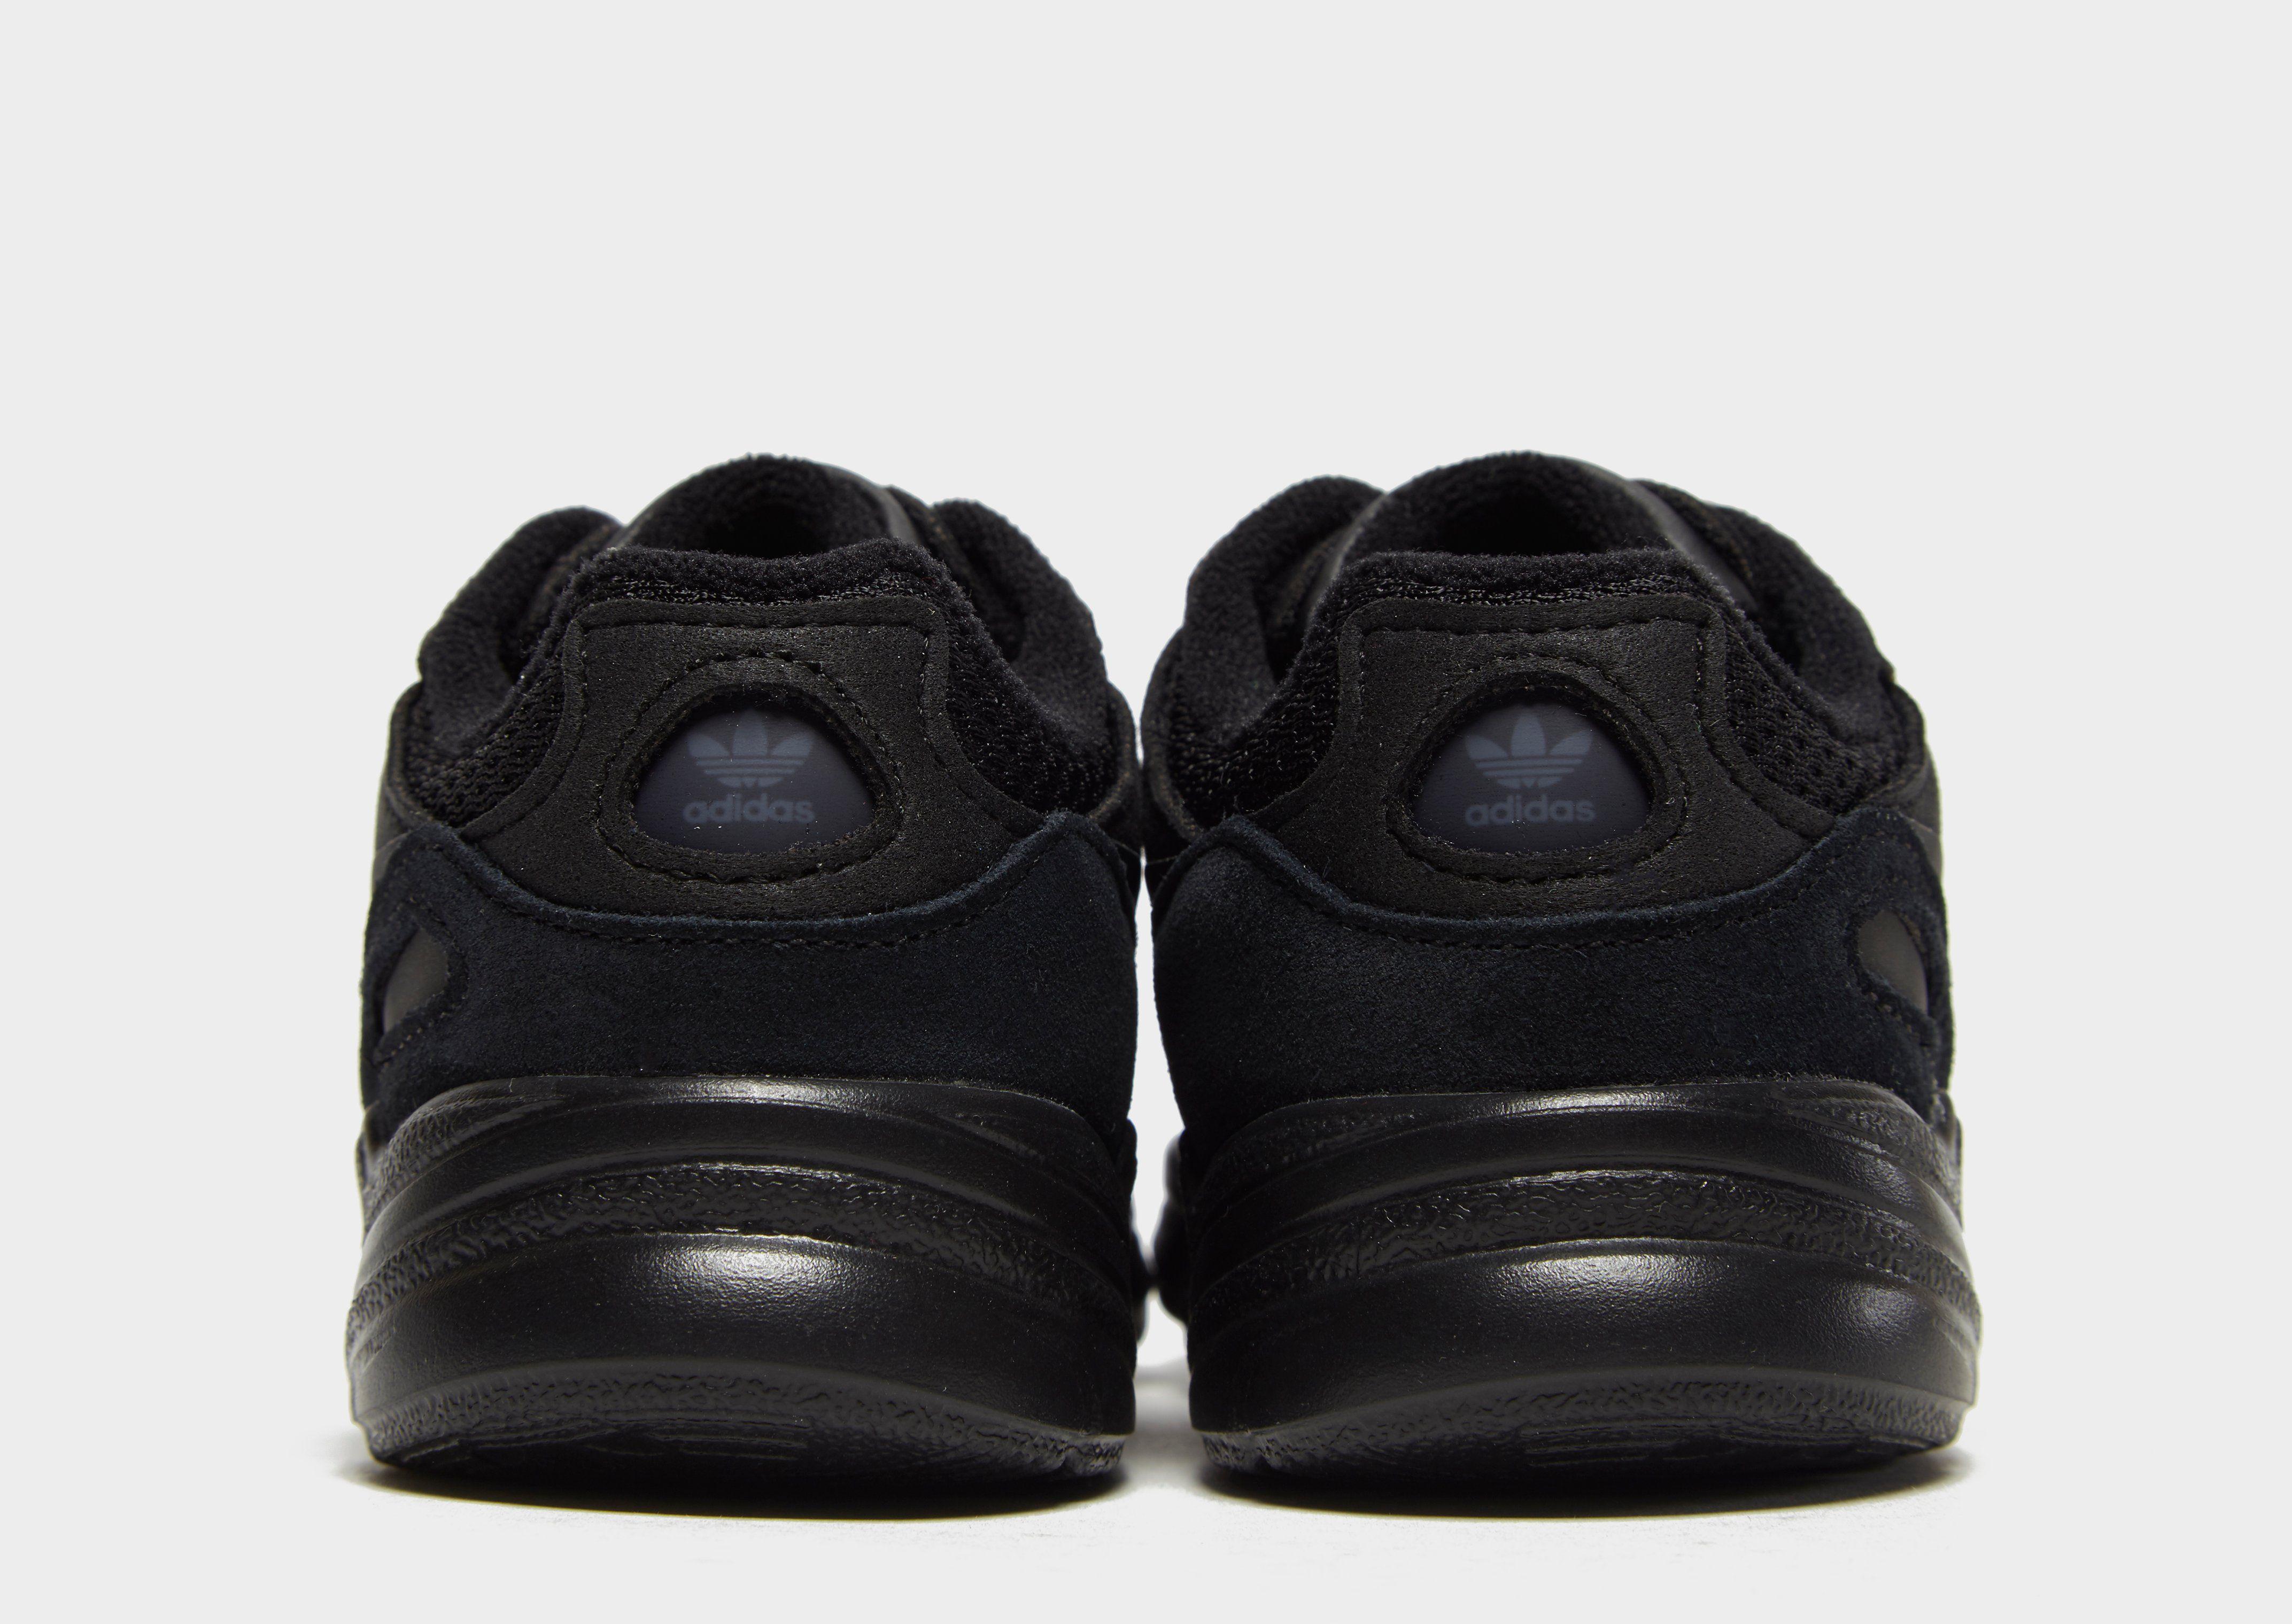 adidas Originals Yung 96 Infant